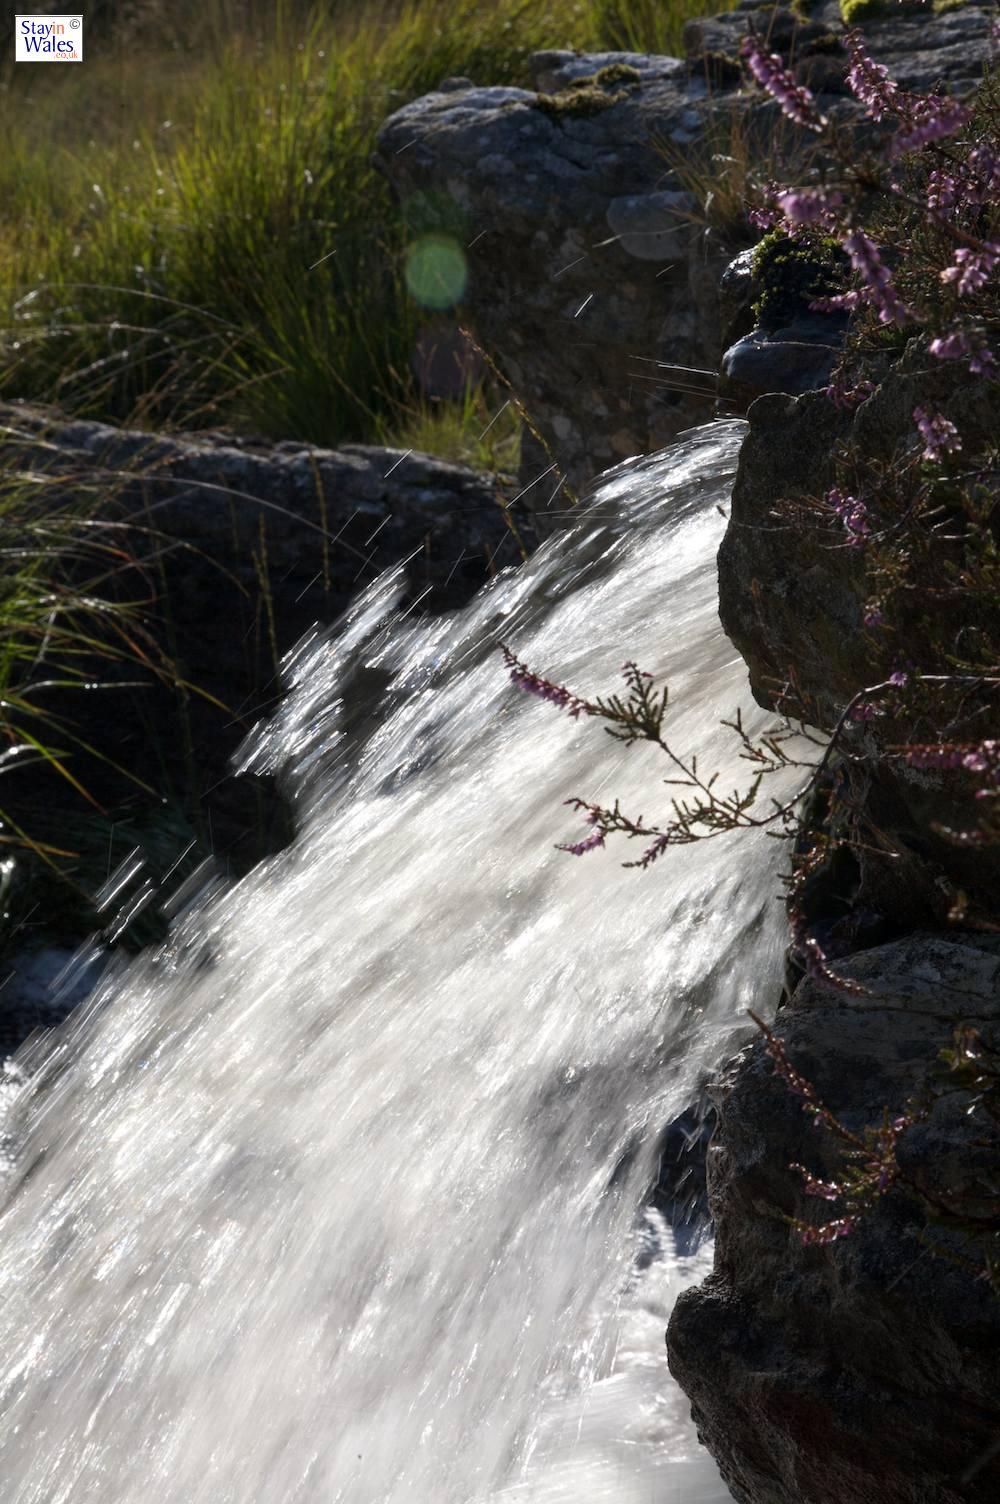 Mountain stream on the Esgair Gelli, running towards the Afon Ca